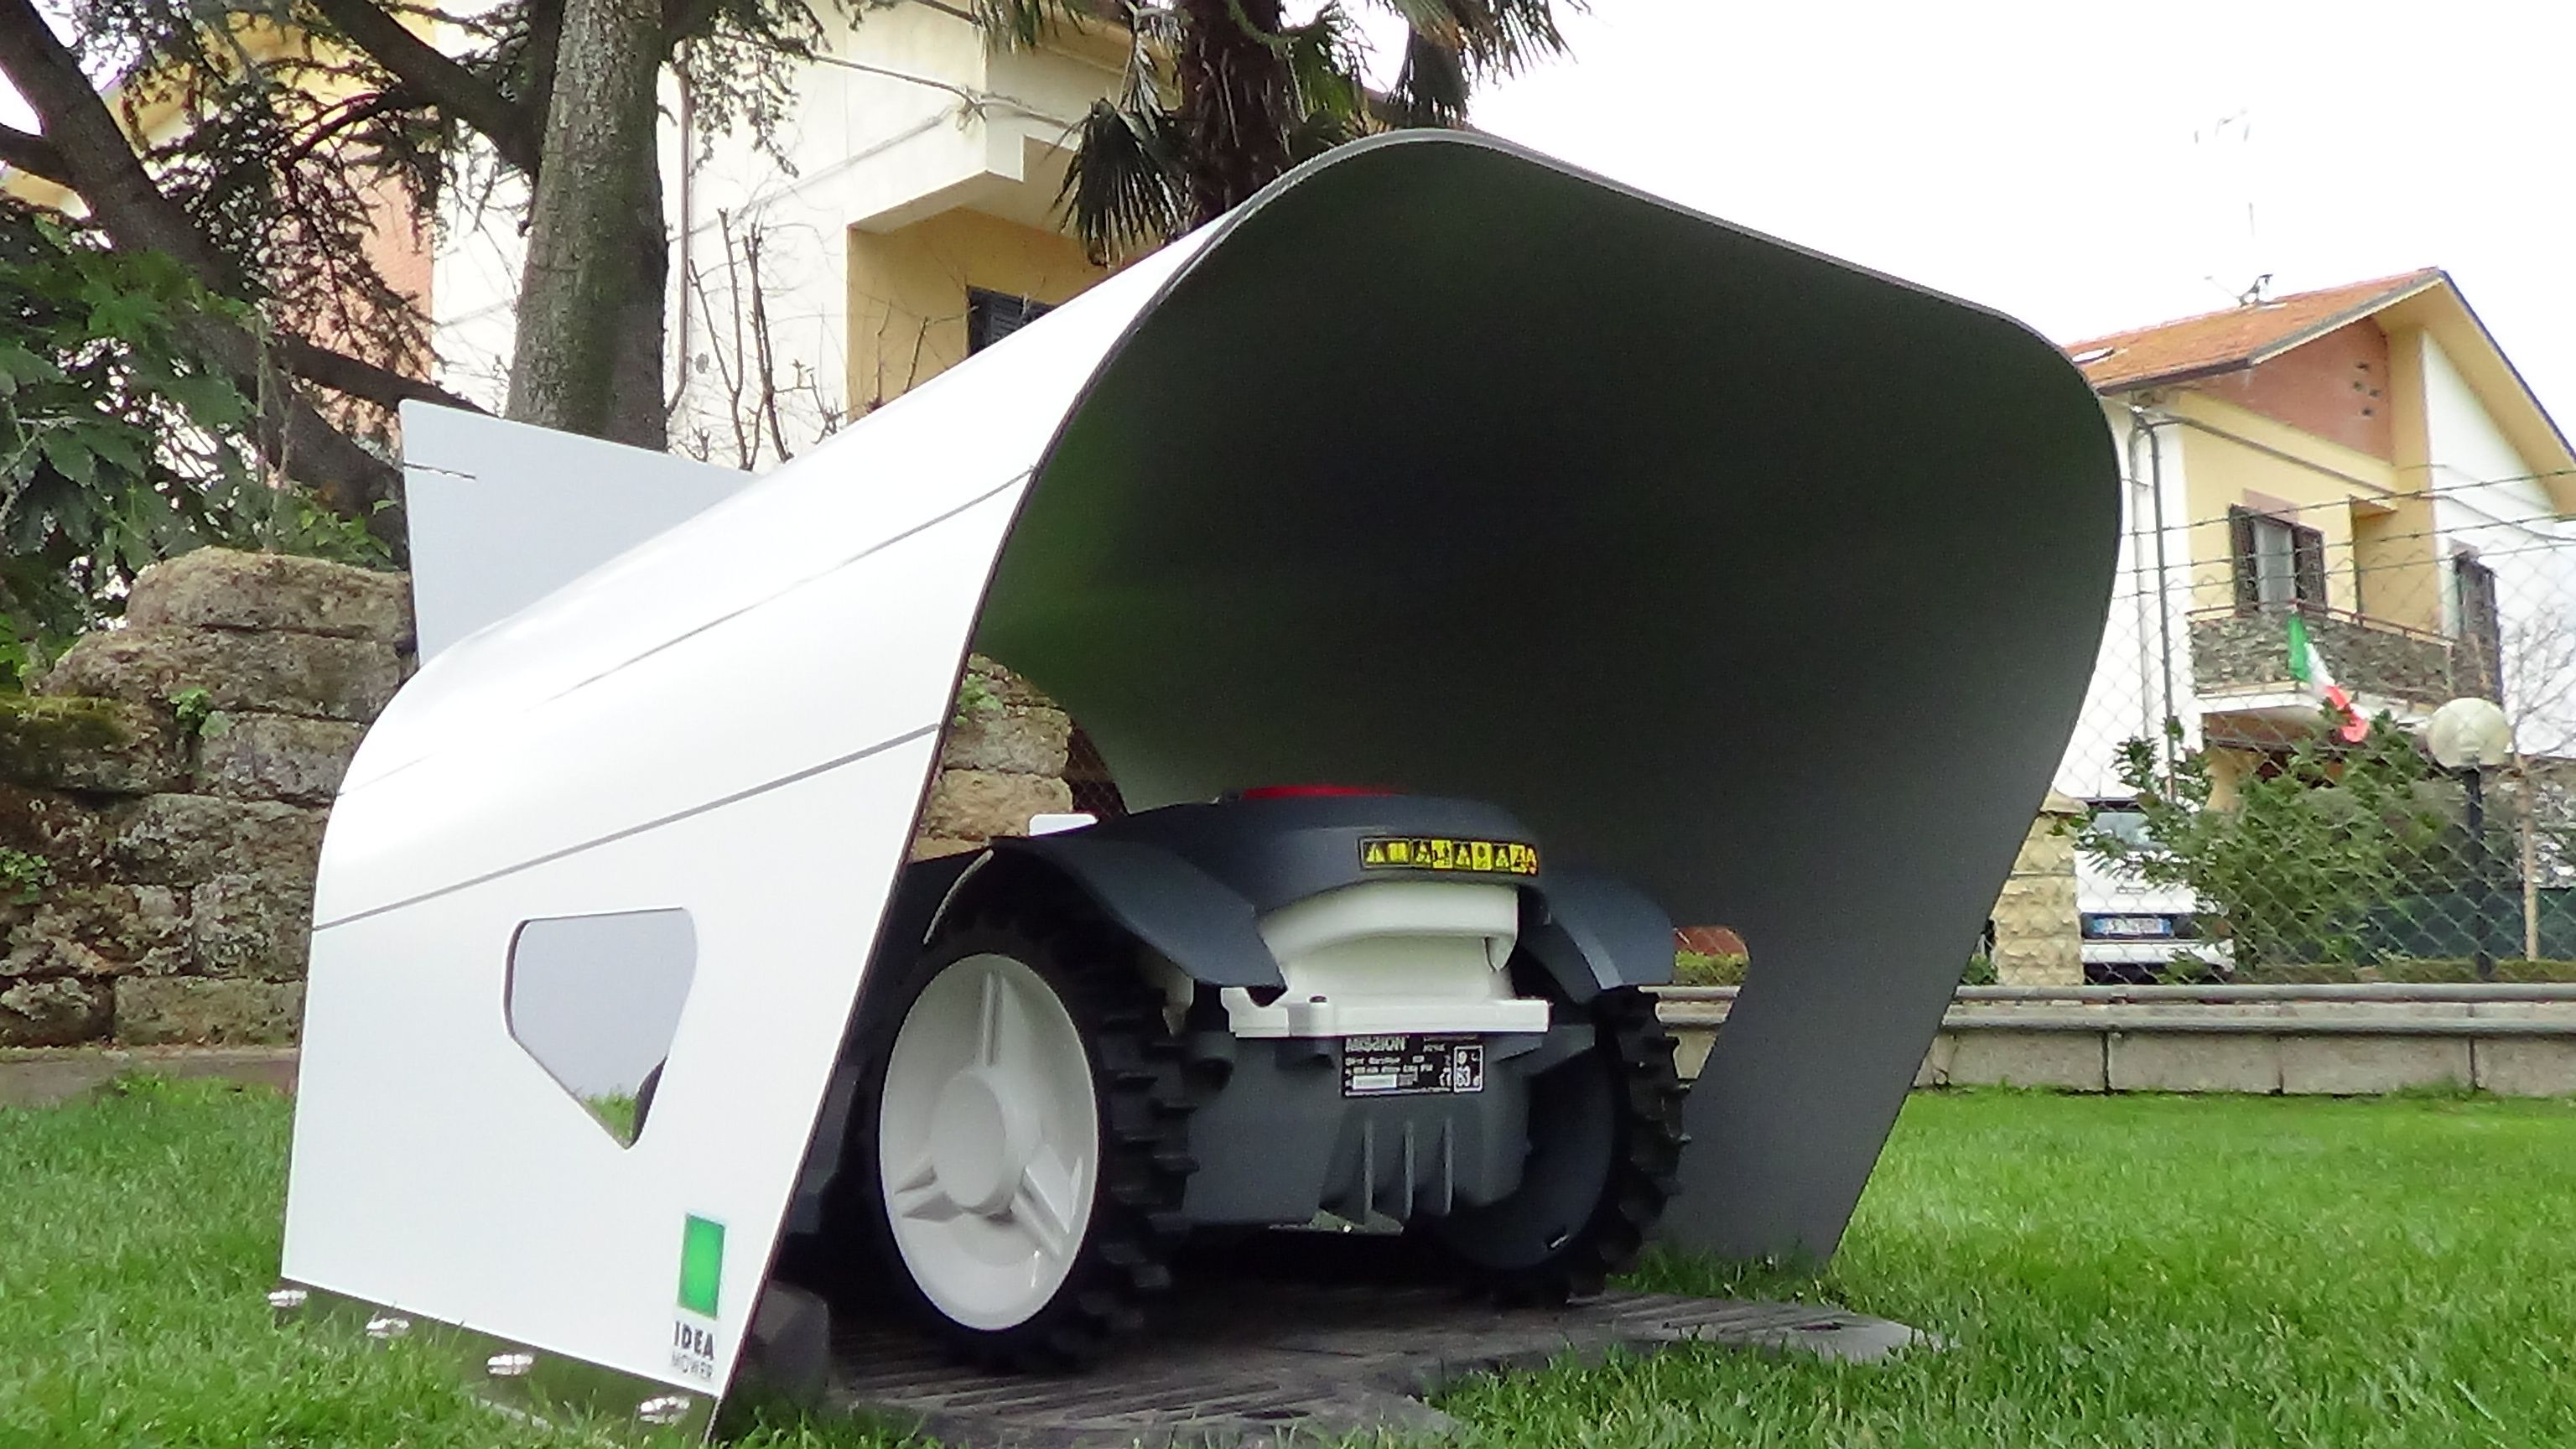 Husqvarna Automower Garage Mähroboter Carport Rasenmäherroboter